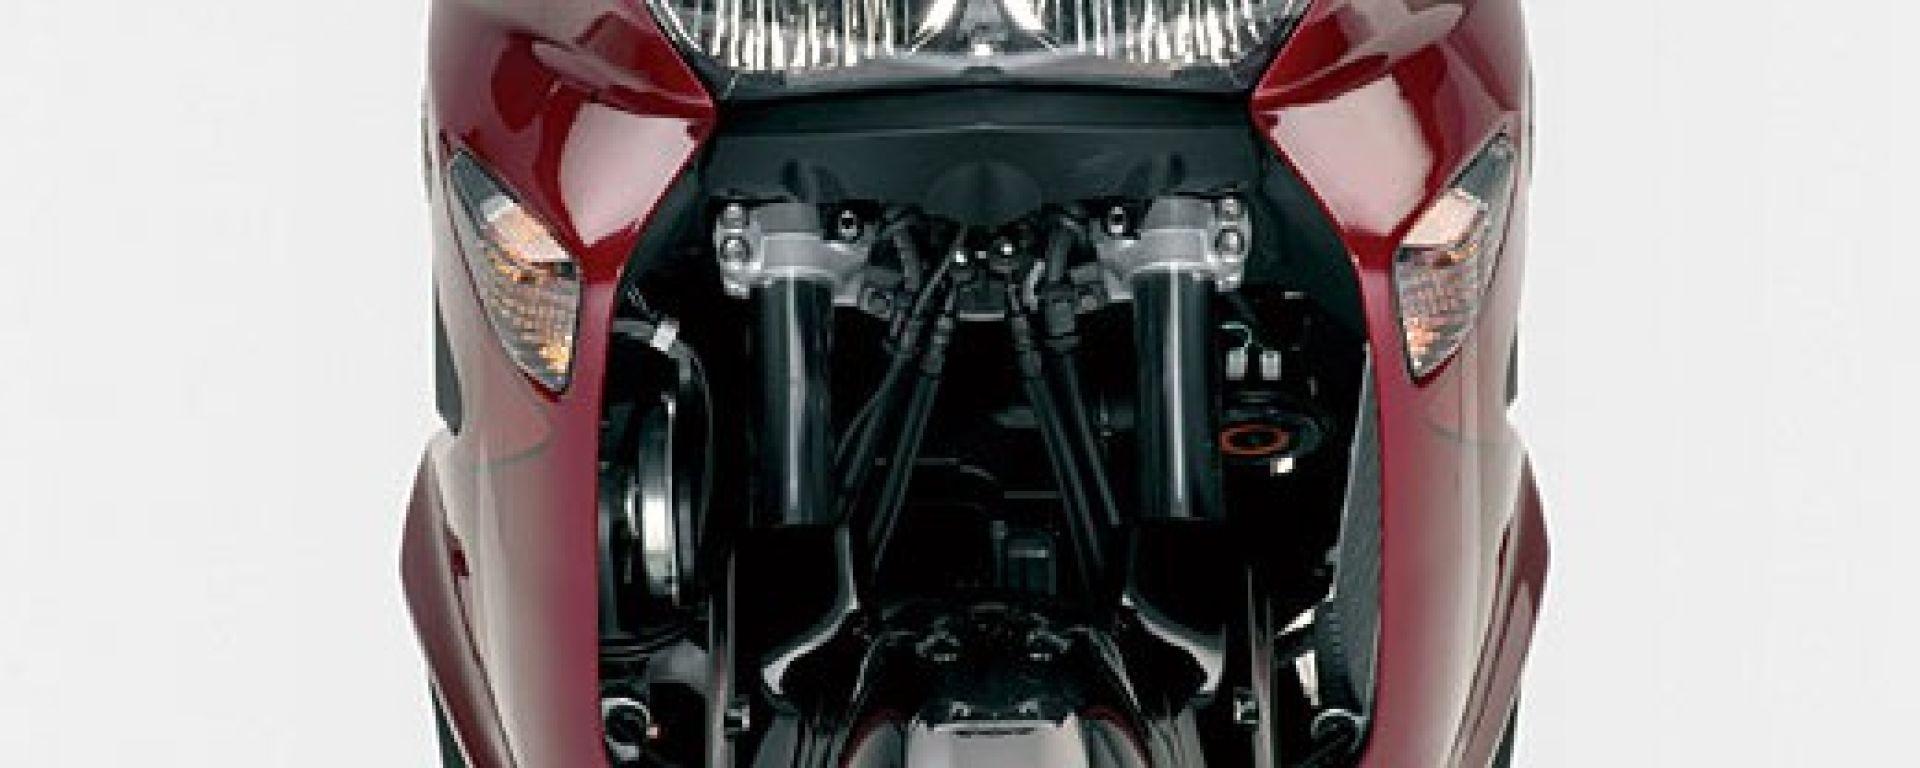 Big Enduro Contro - Honda Varadero ABS